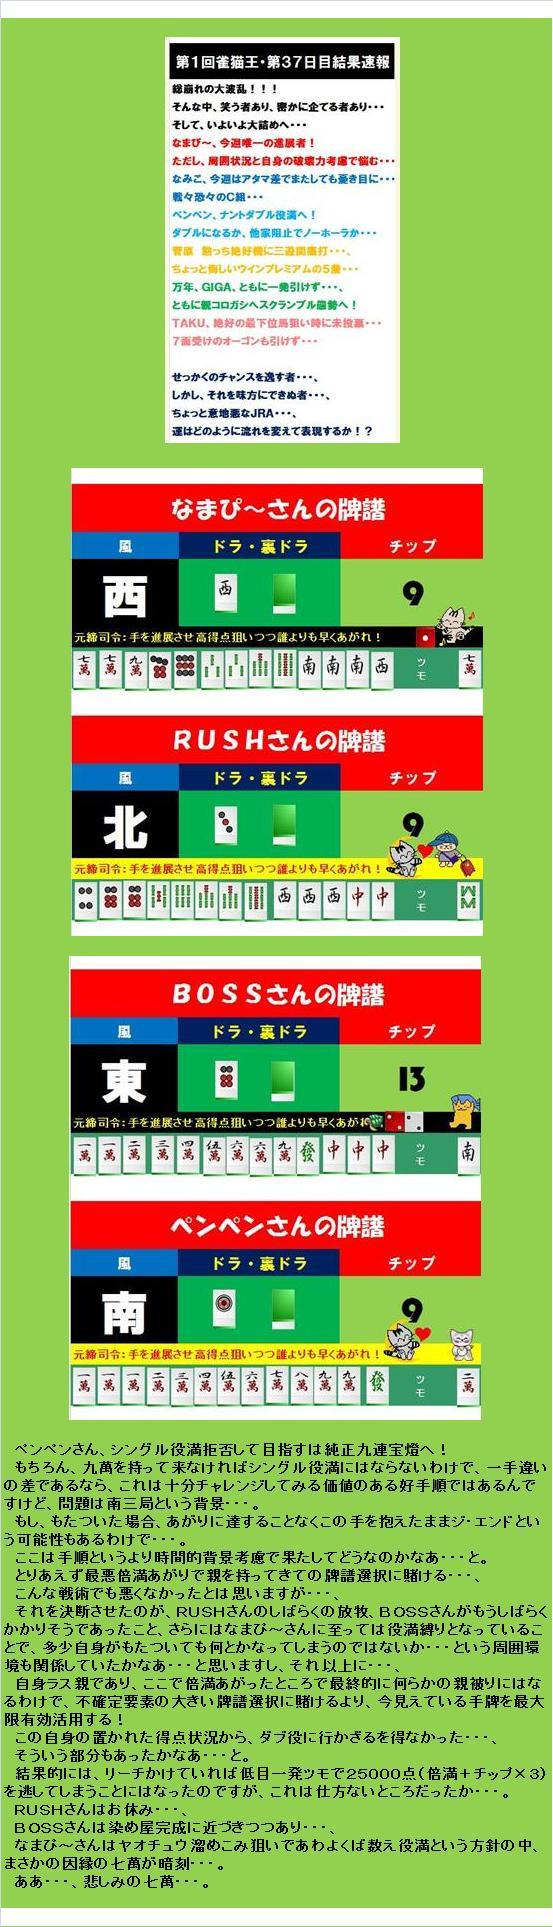 20100226・A組回顧18.jpg